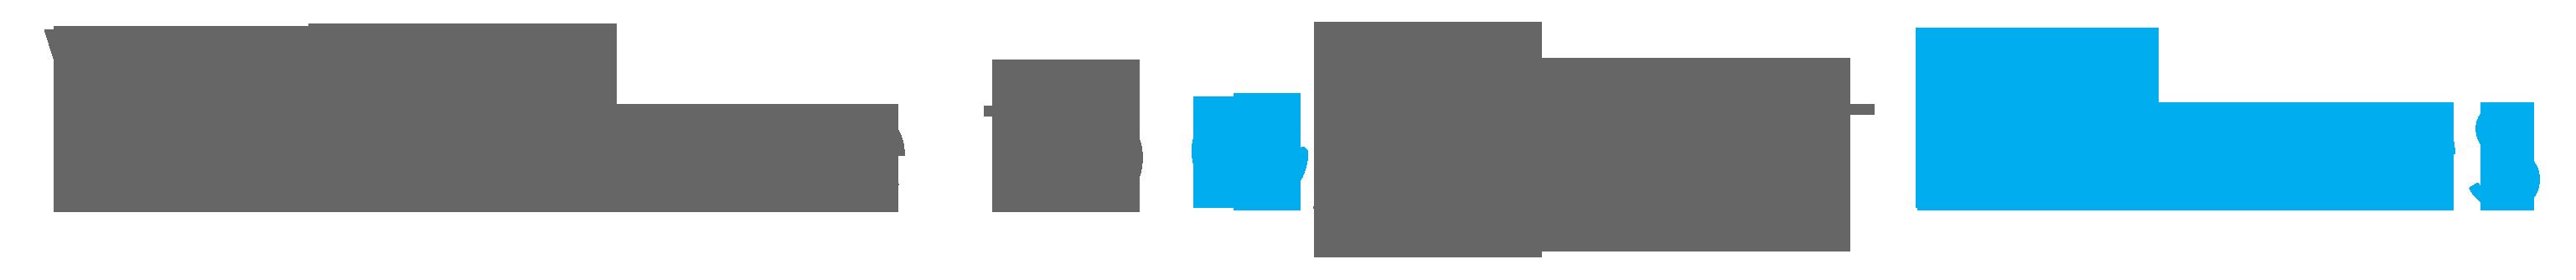 Welcome to eAgentHomes.com